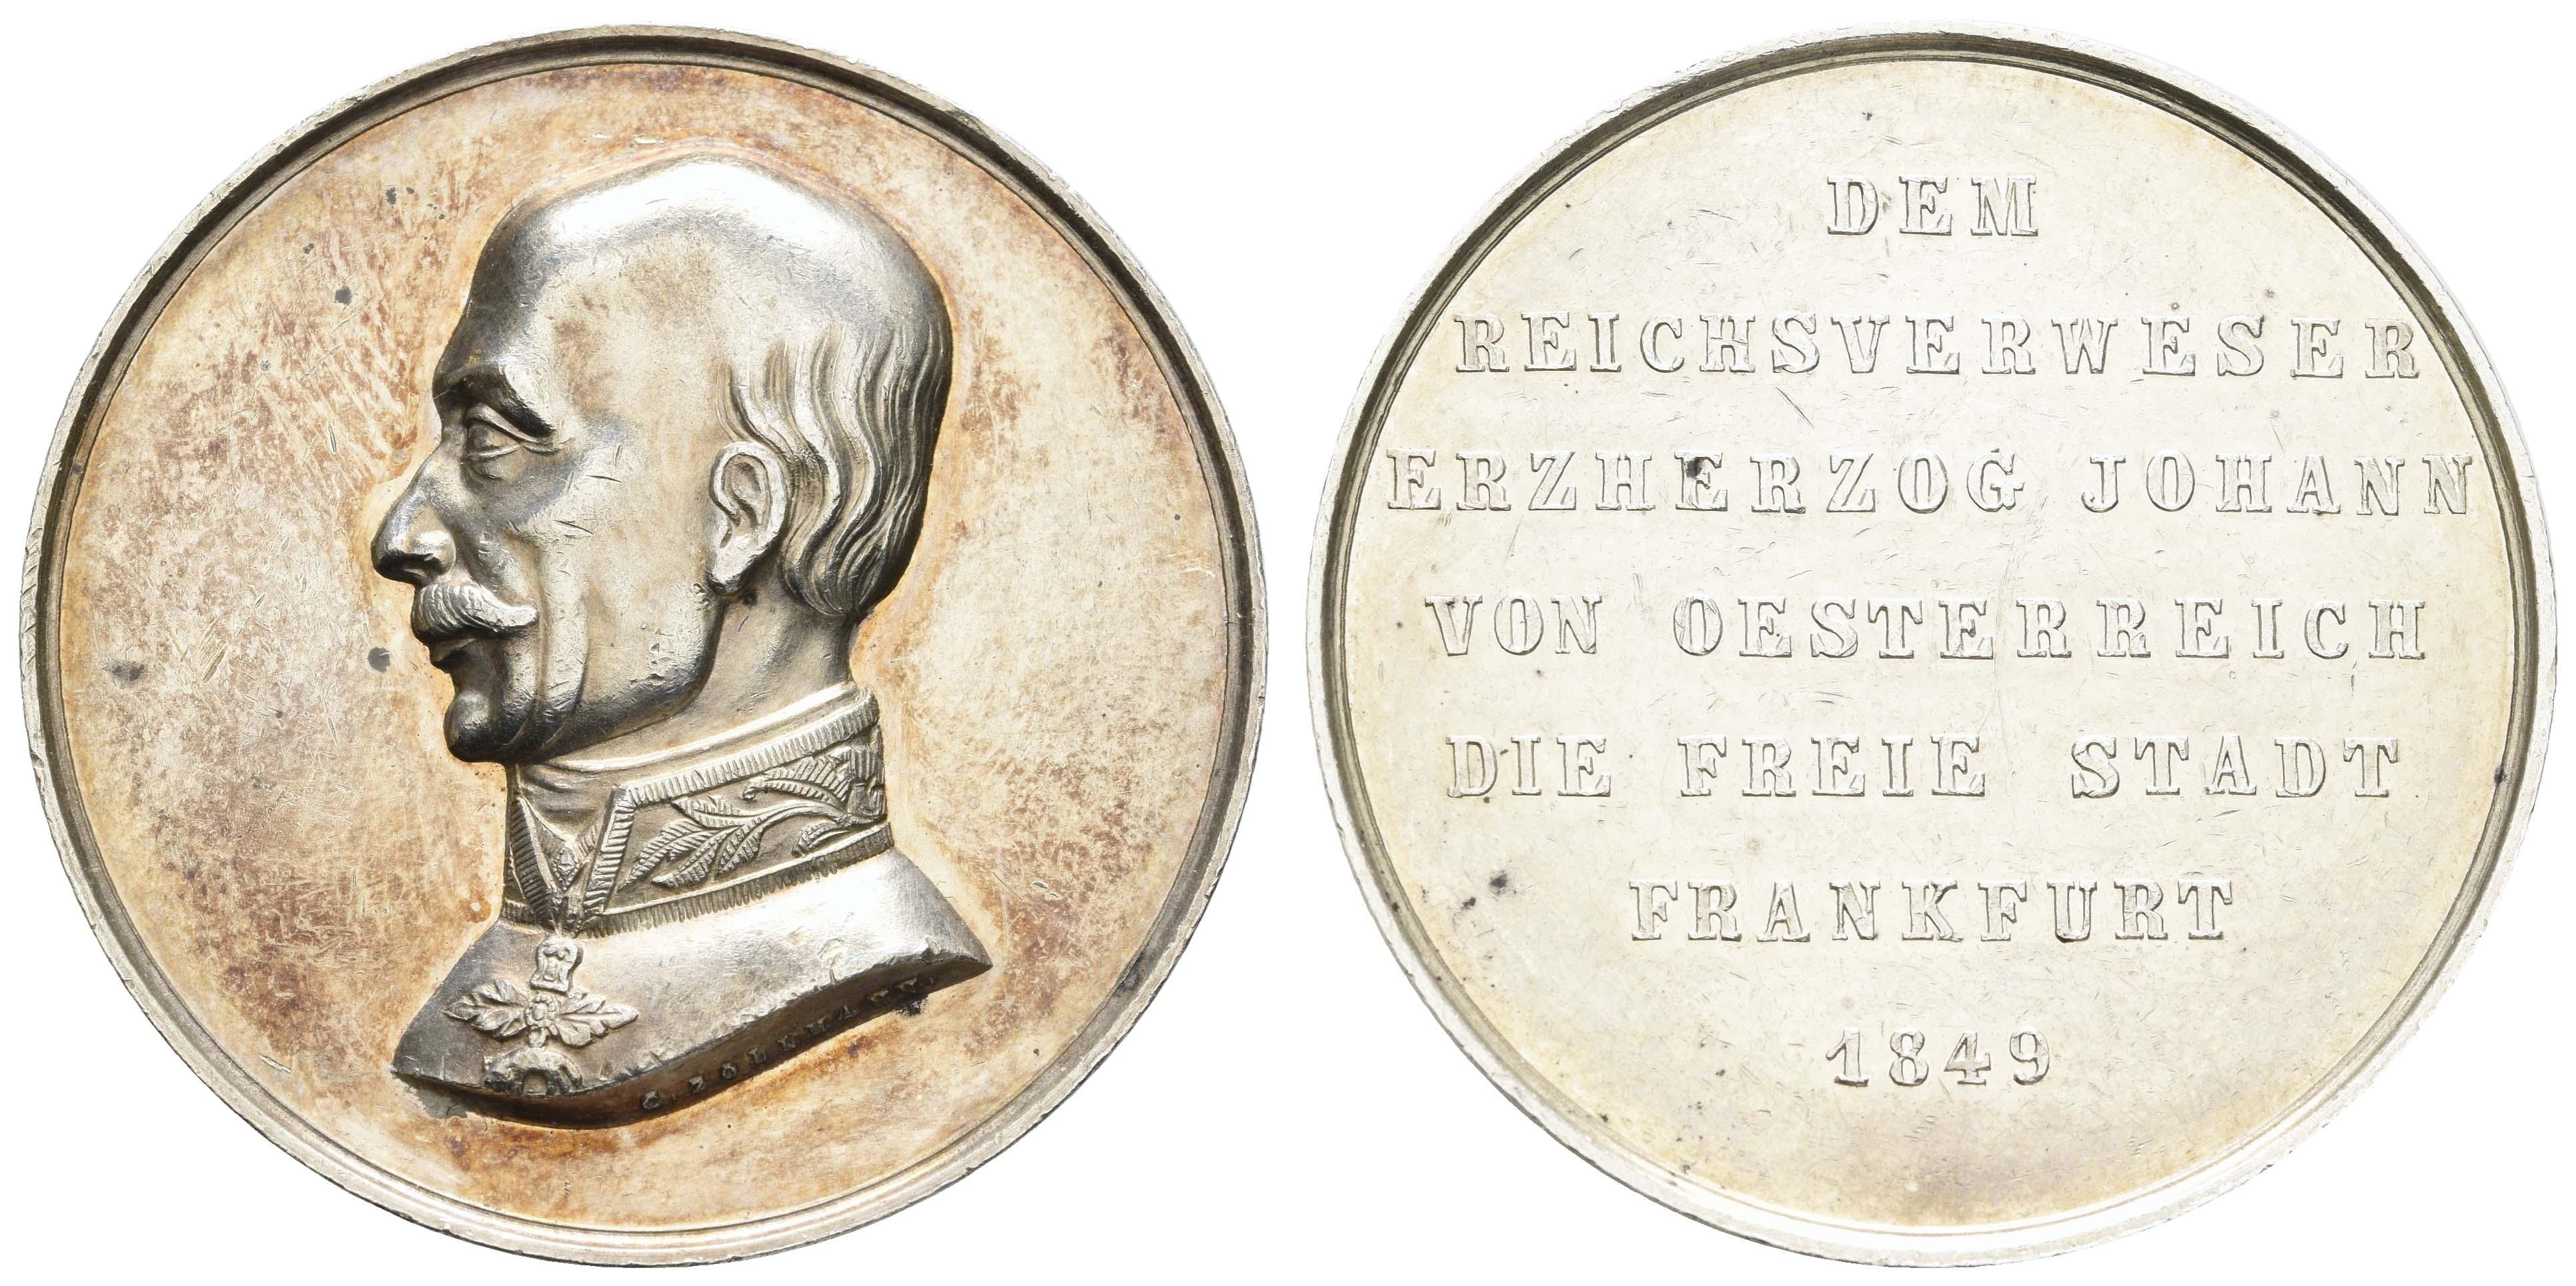 Lot 1849 - Medaillen_Sonstige Medaillen_Städtemedaillen  -  Auktionshaus Ulrich Felzmann GmbH & Co. KG Auction 170 International Autumn Auction 2020 Day 2